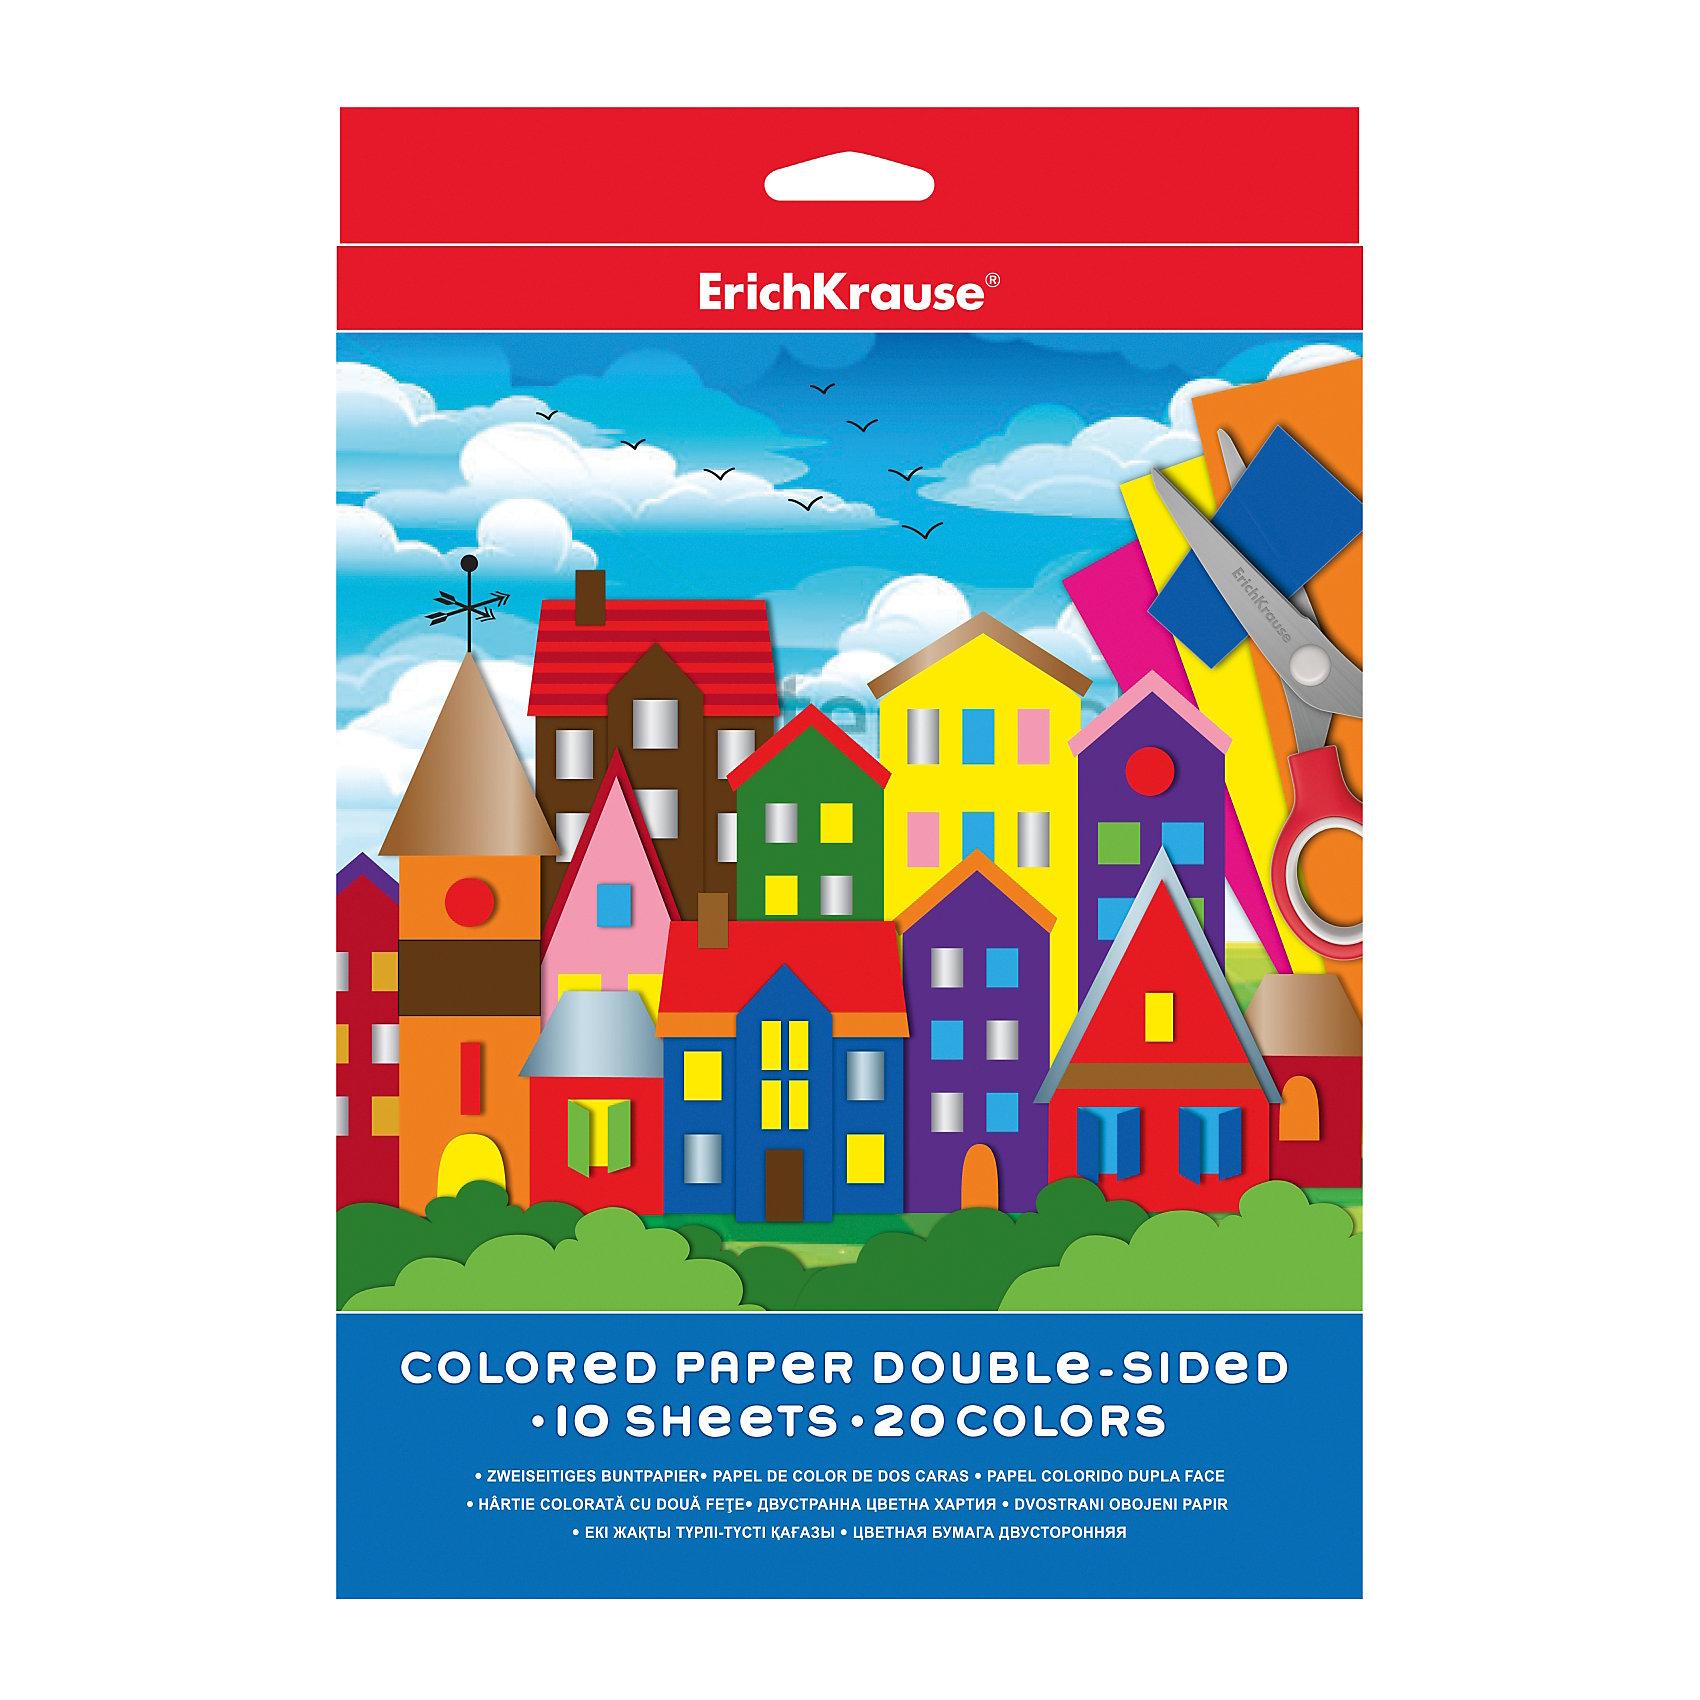 ErichKrause Двусторонняя цветная бумага А4 (10 листов, 20 цветов) artspace бумага цветная самоклеящаяся 10 листов 10 цветов